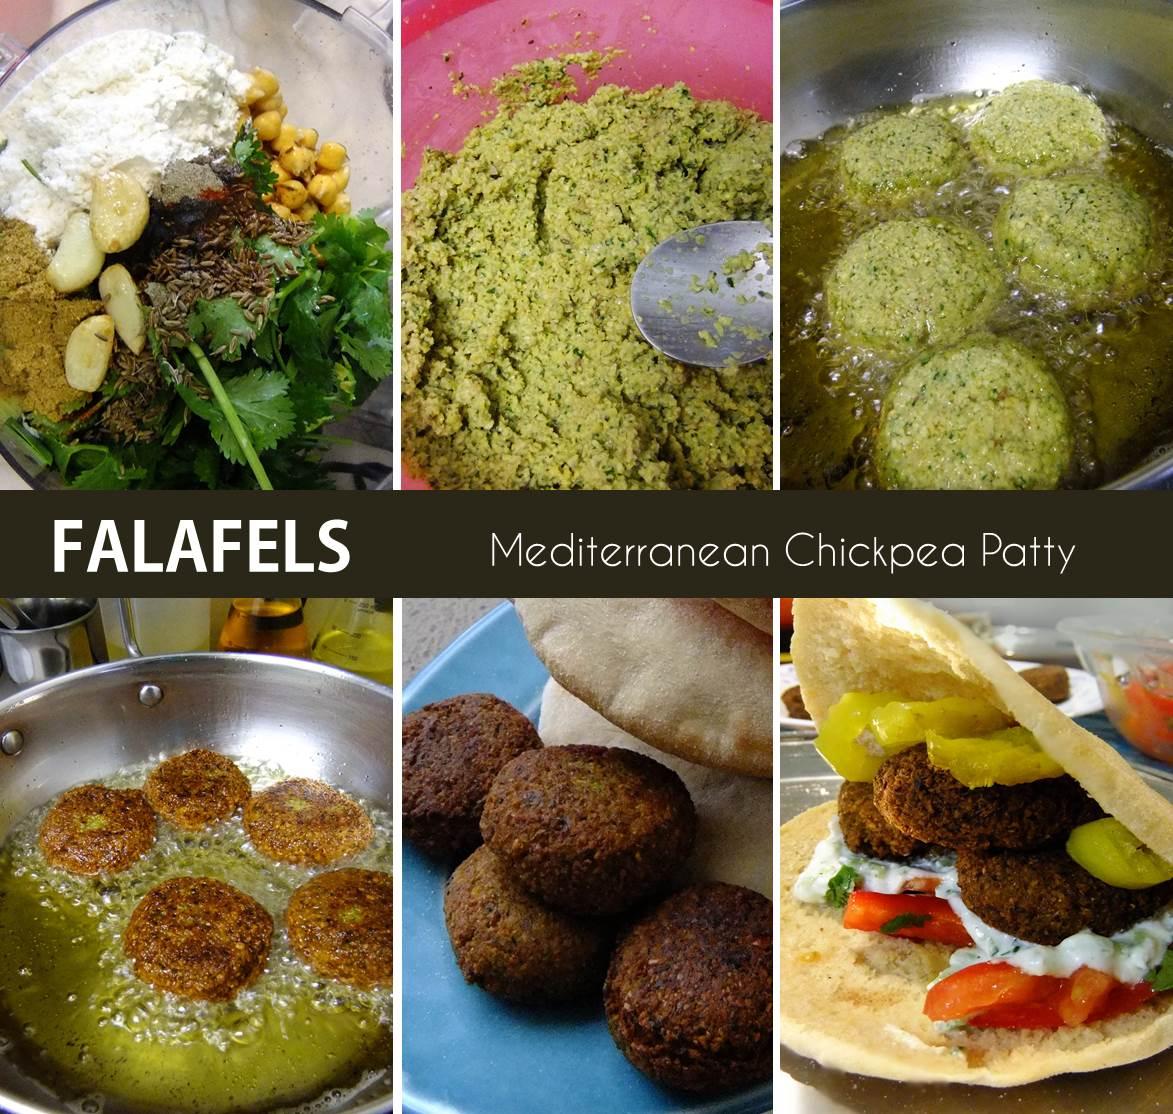 falafel stepwise